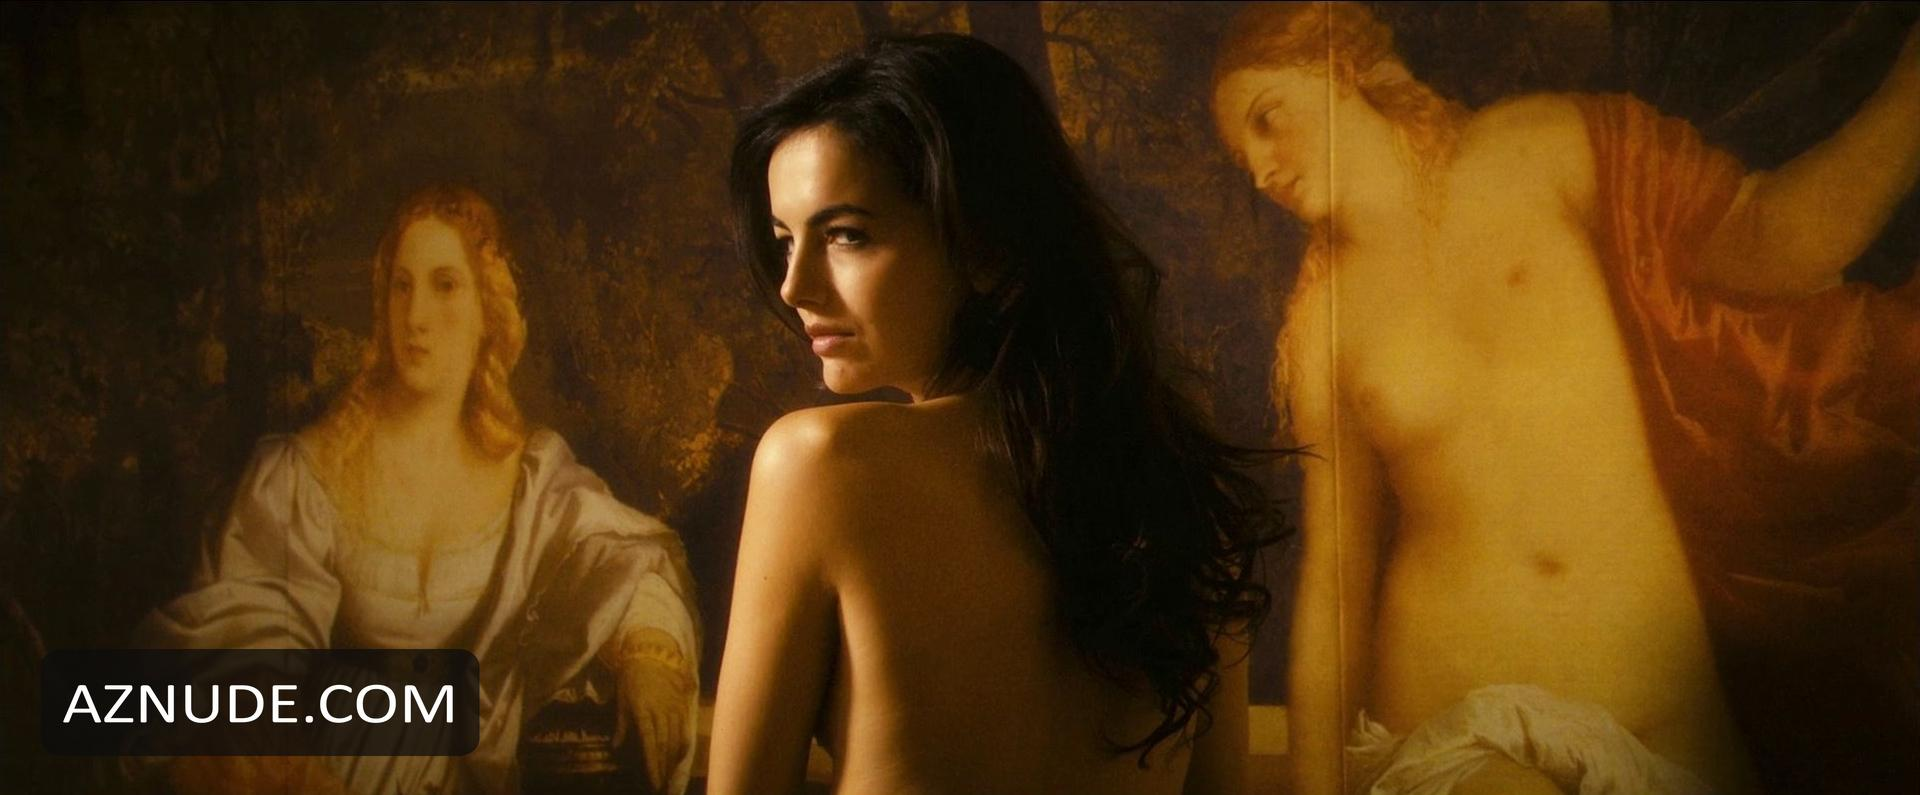 camilla belle nude